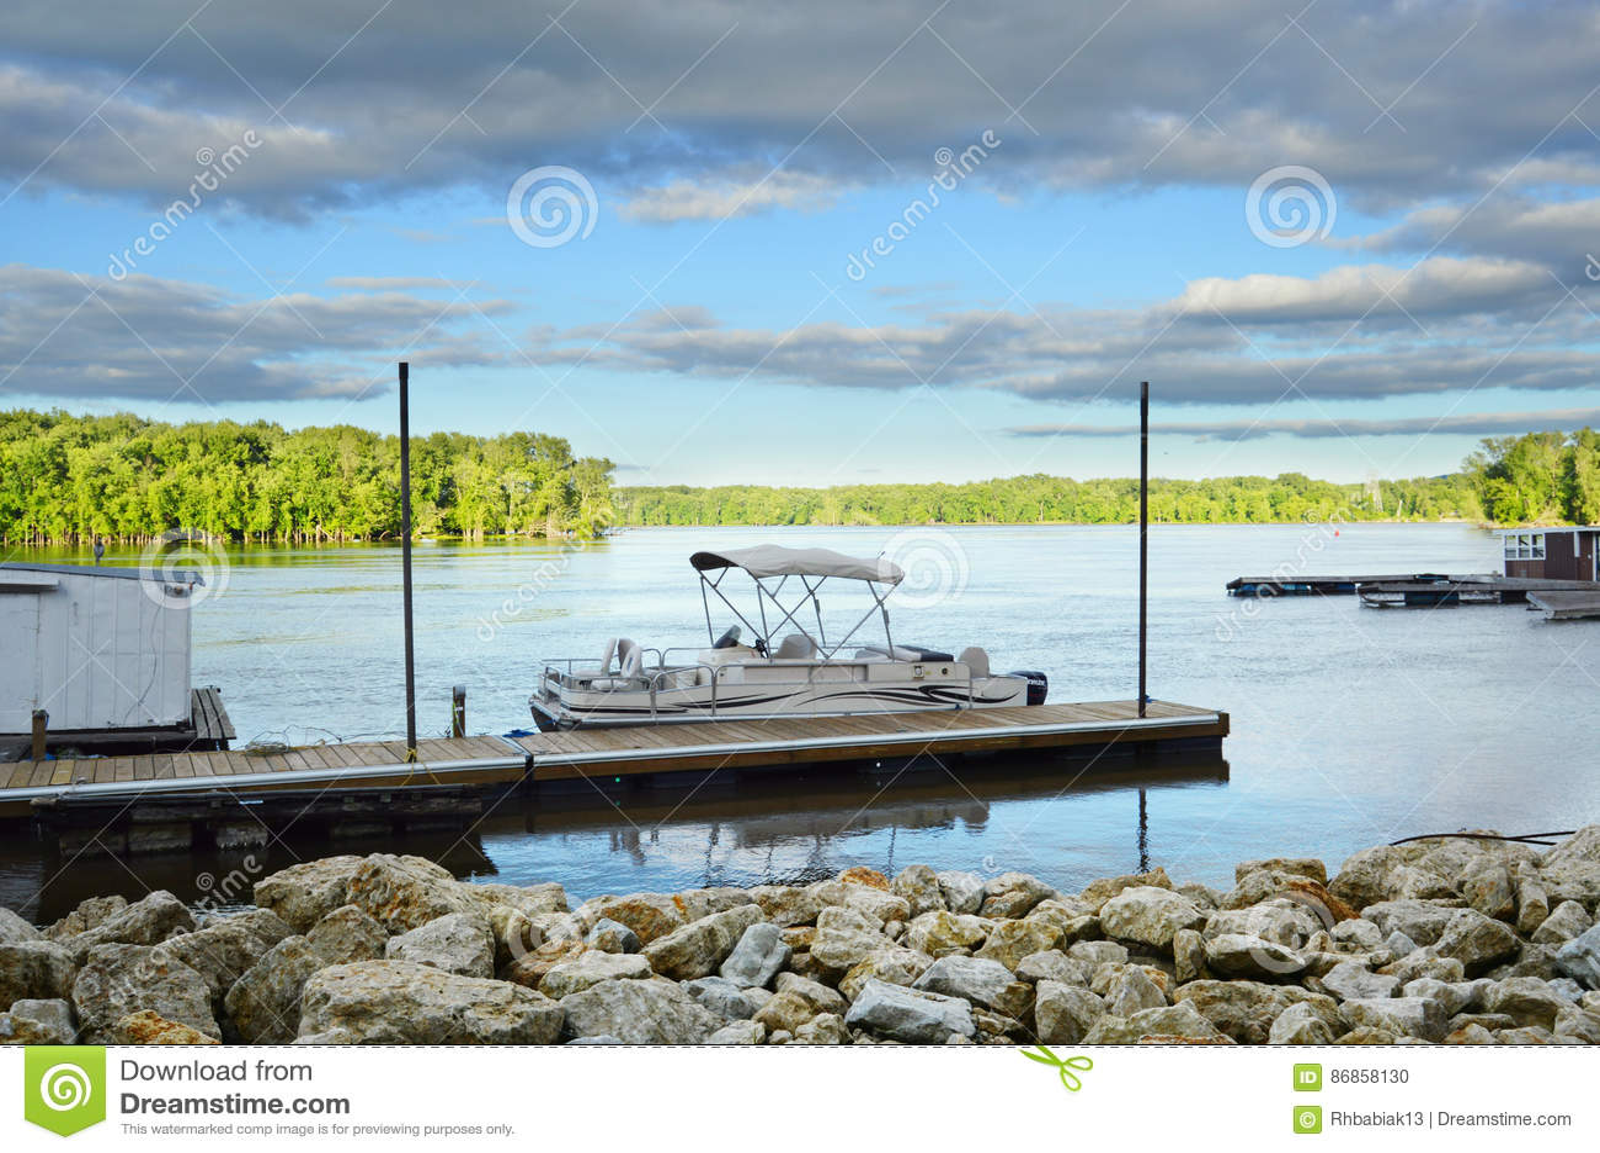 Download Boat Docked on Lake stock photo. Image of leisure, lake - 86858130